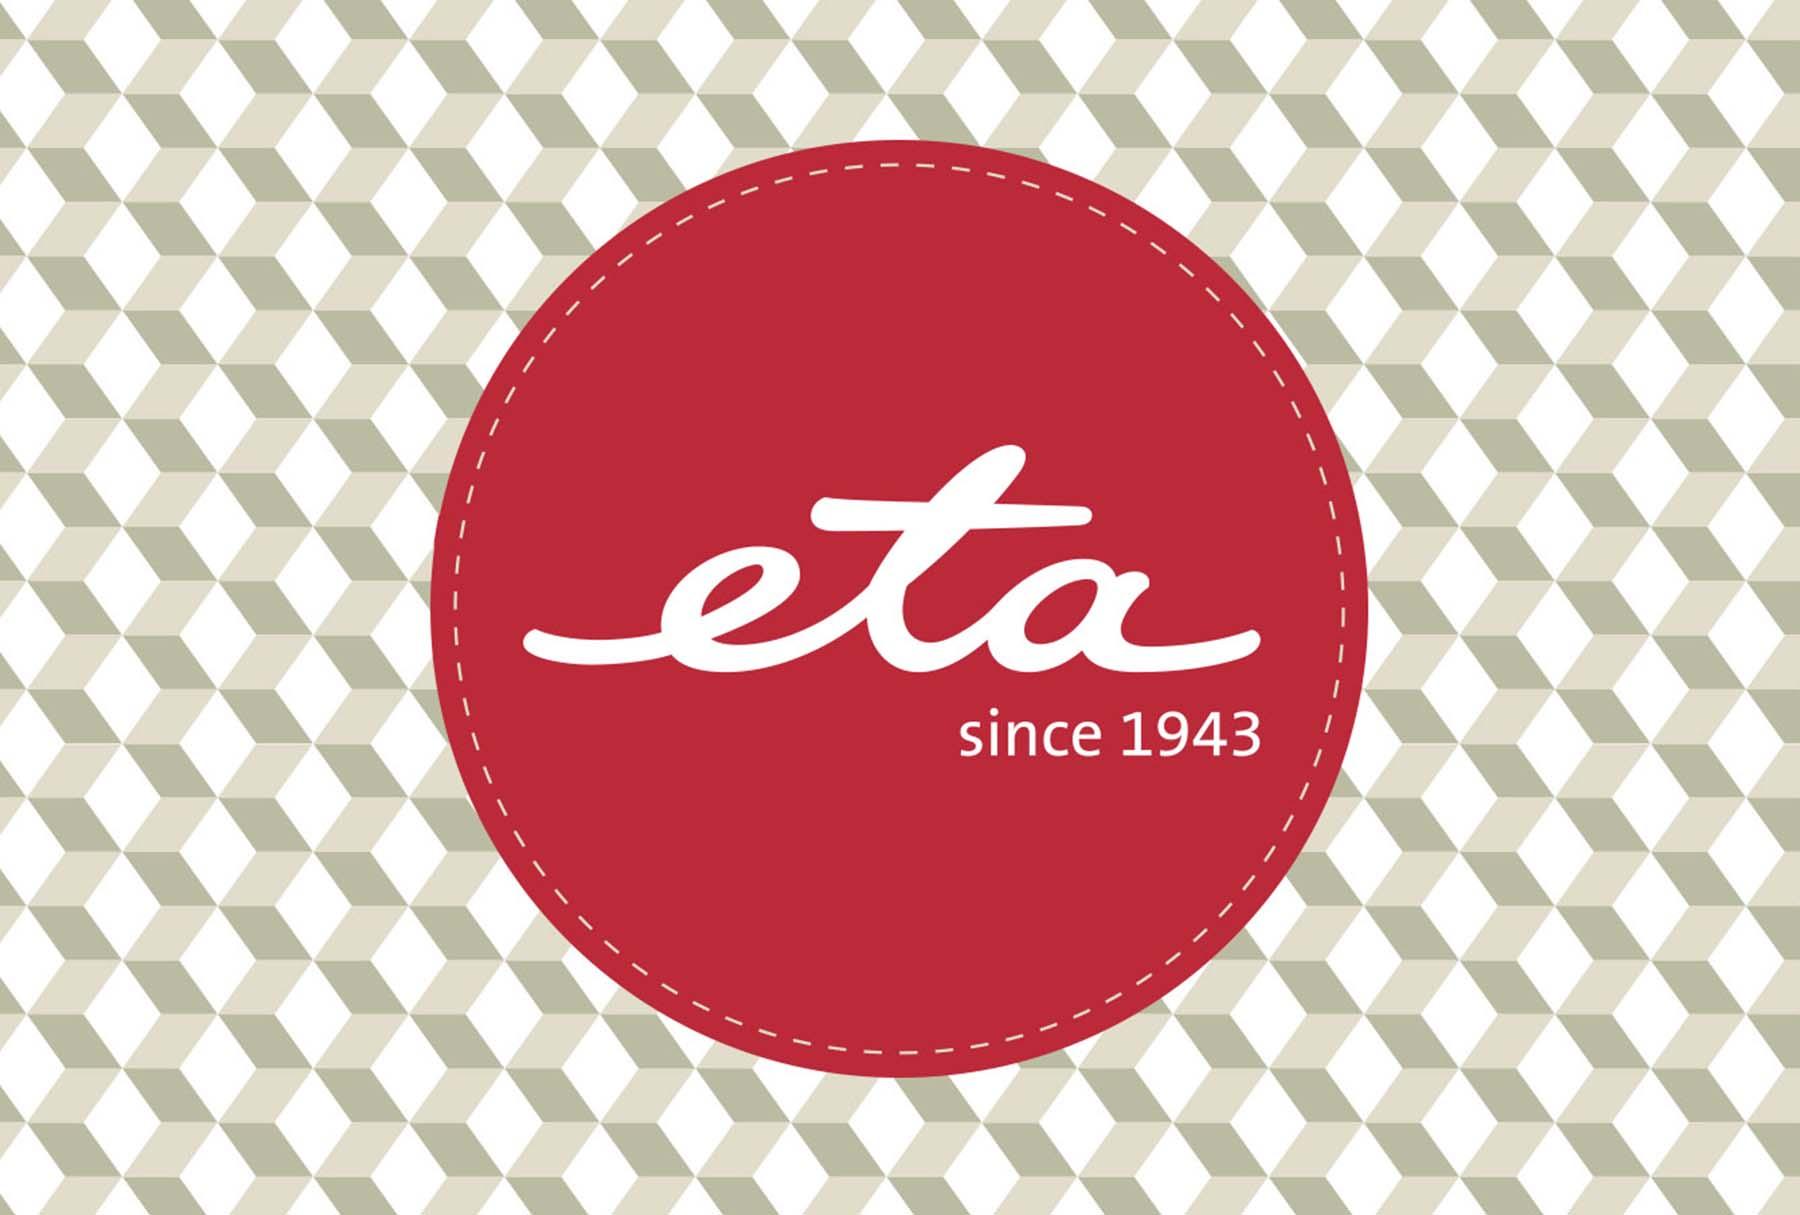 Eta 75 let